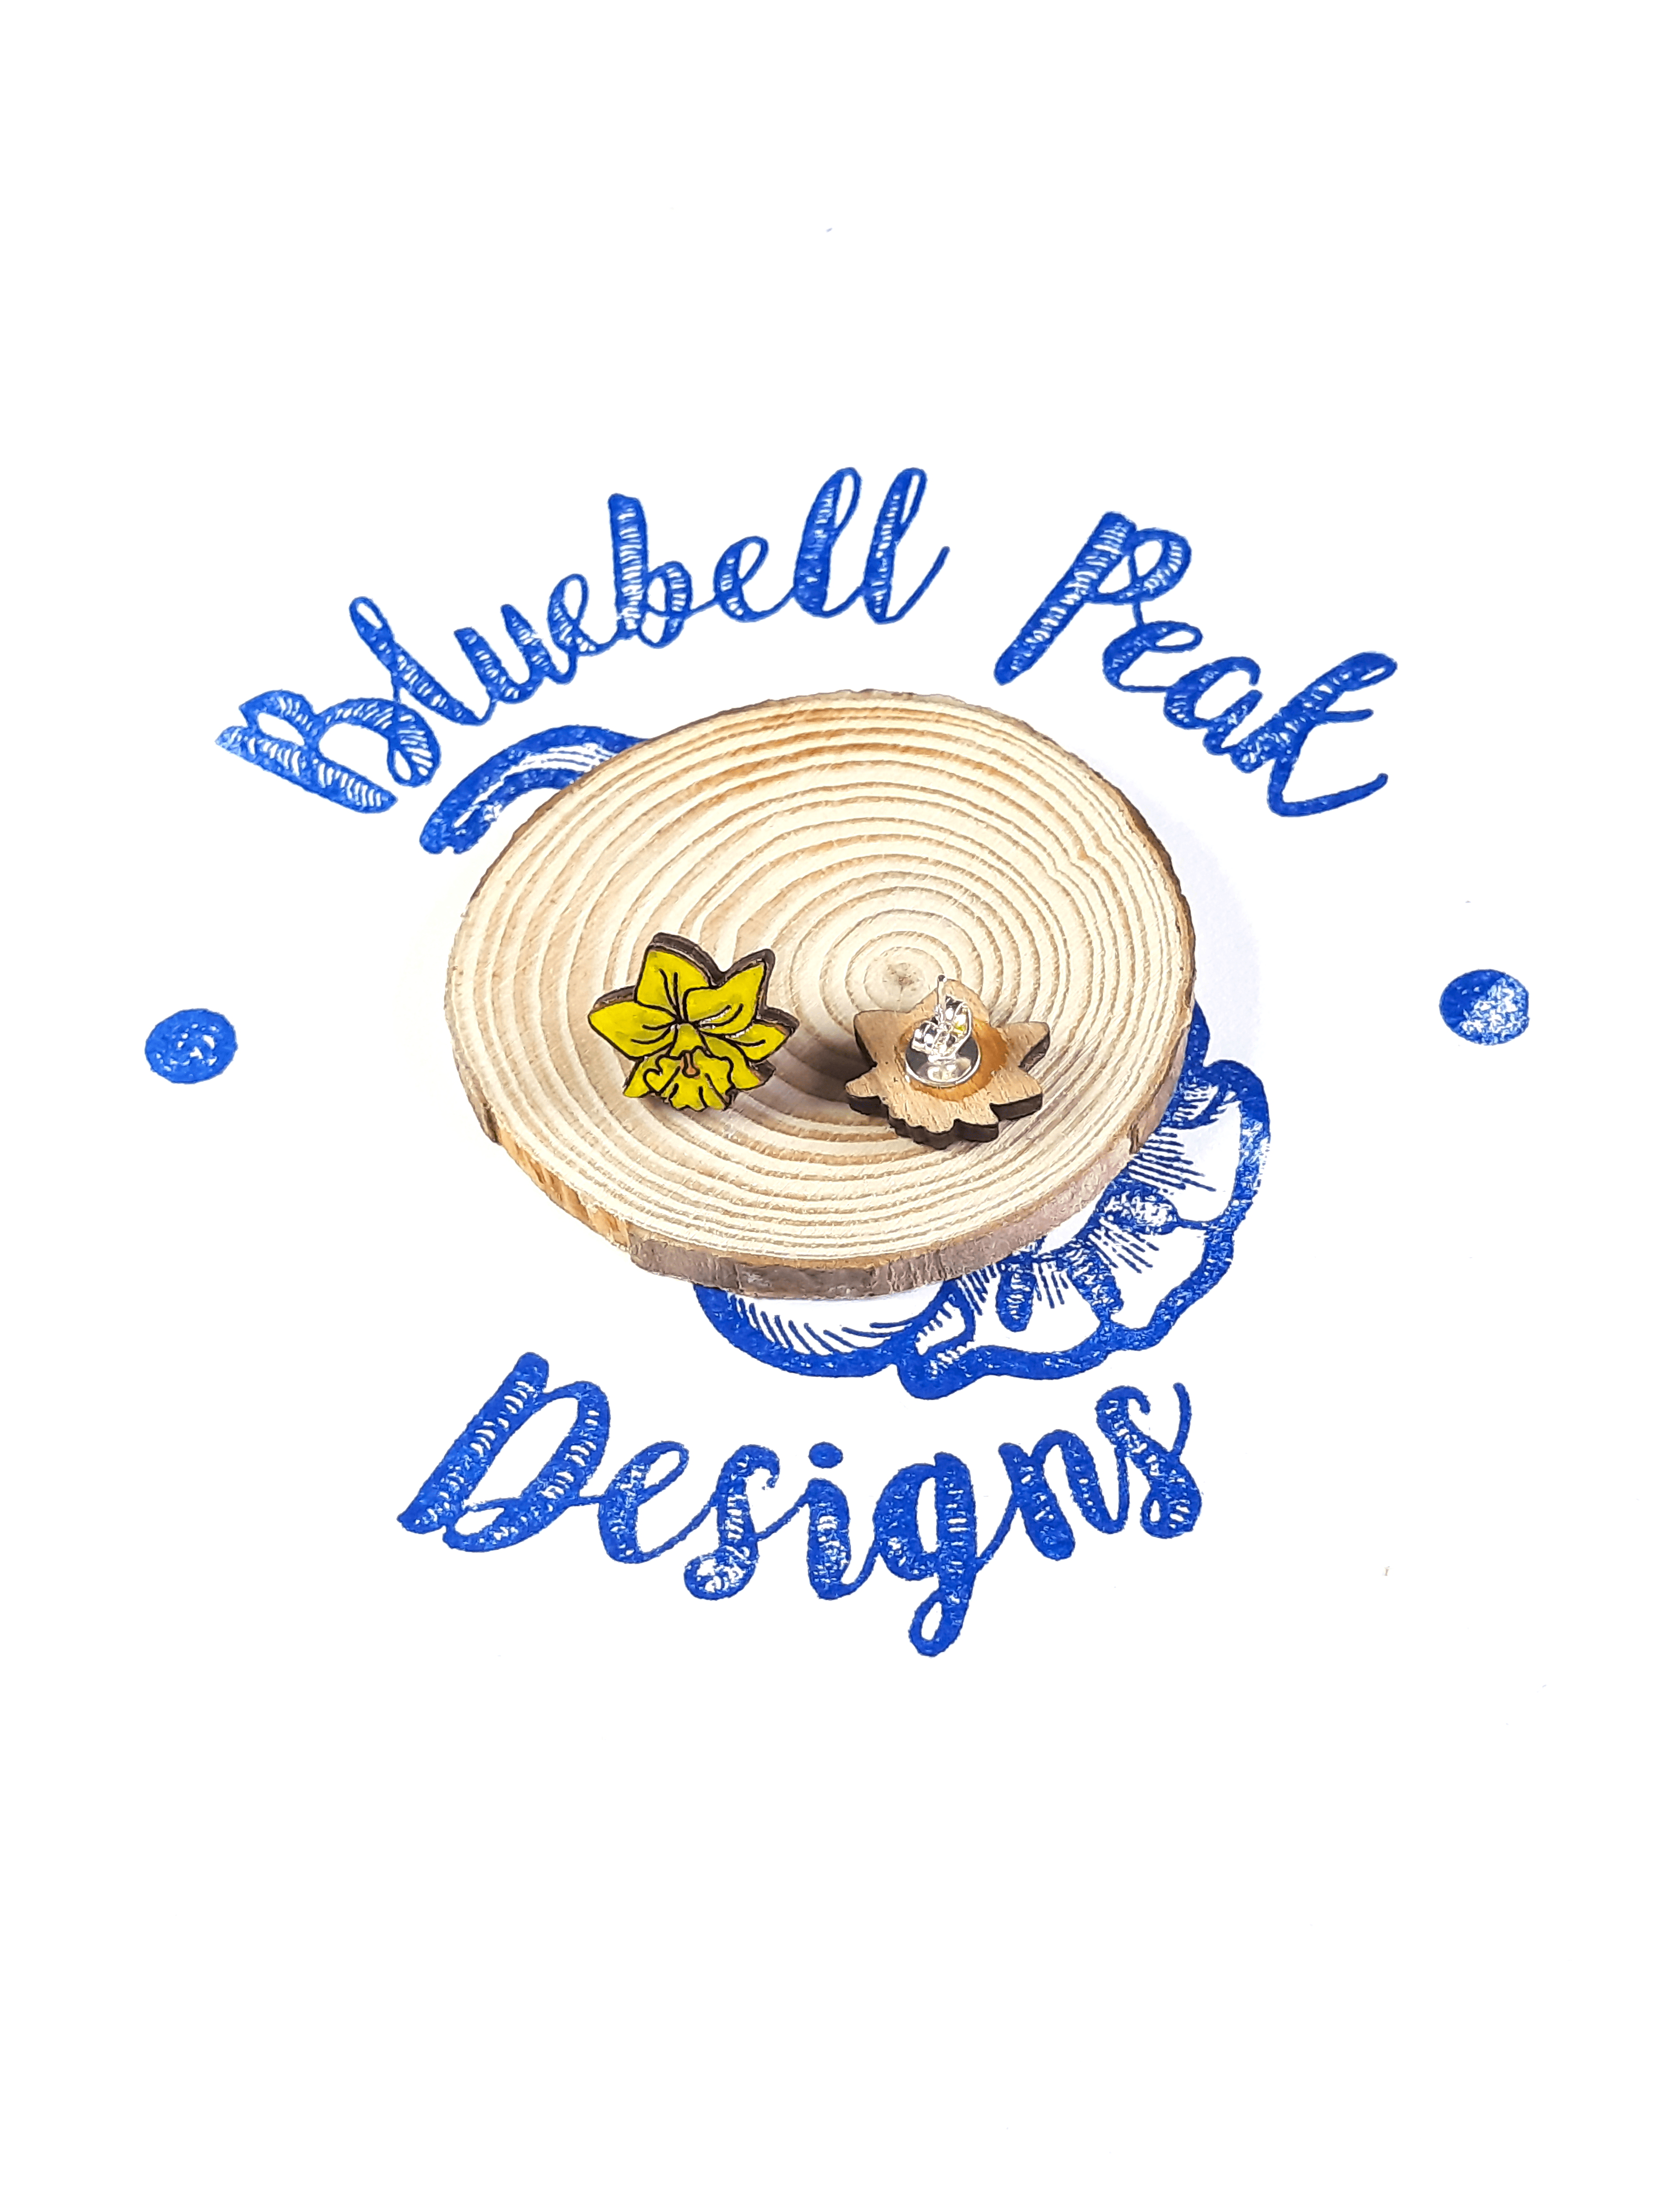 Daffodil - Stud Earrings